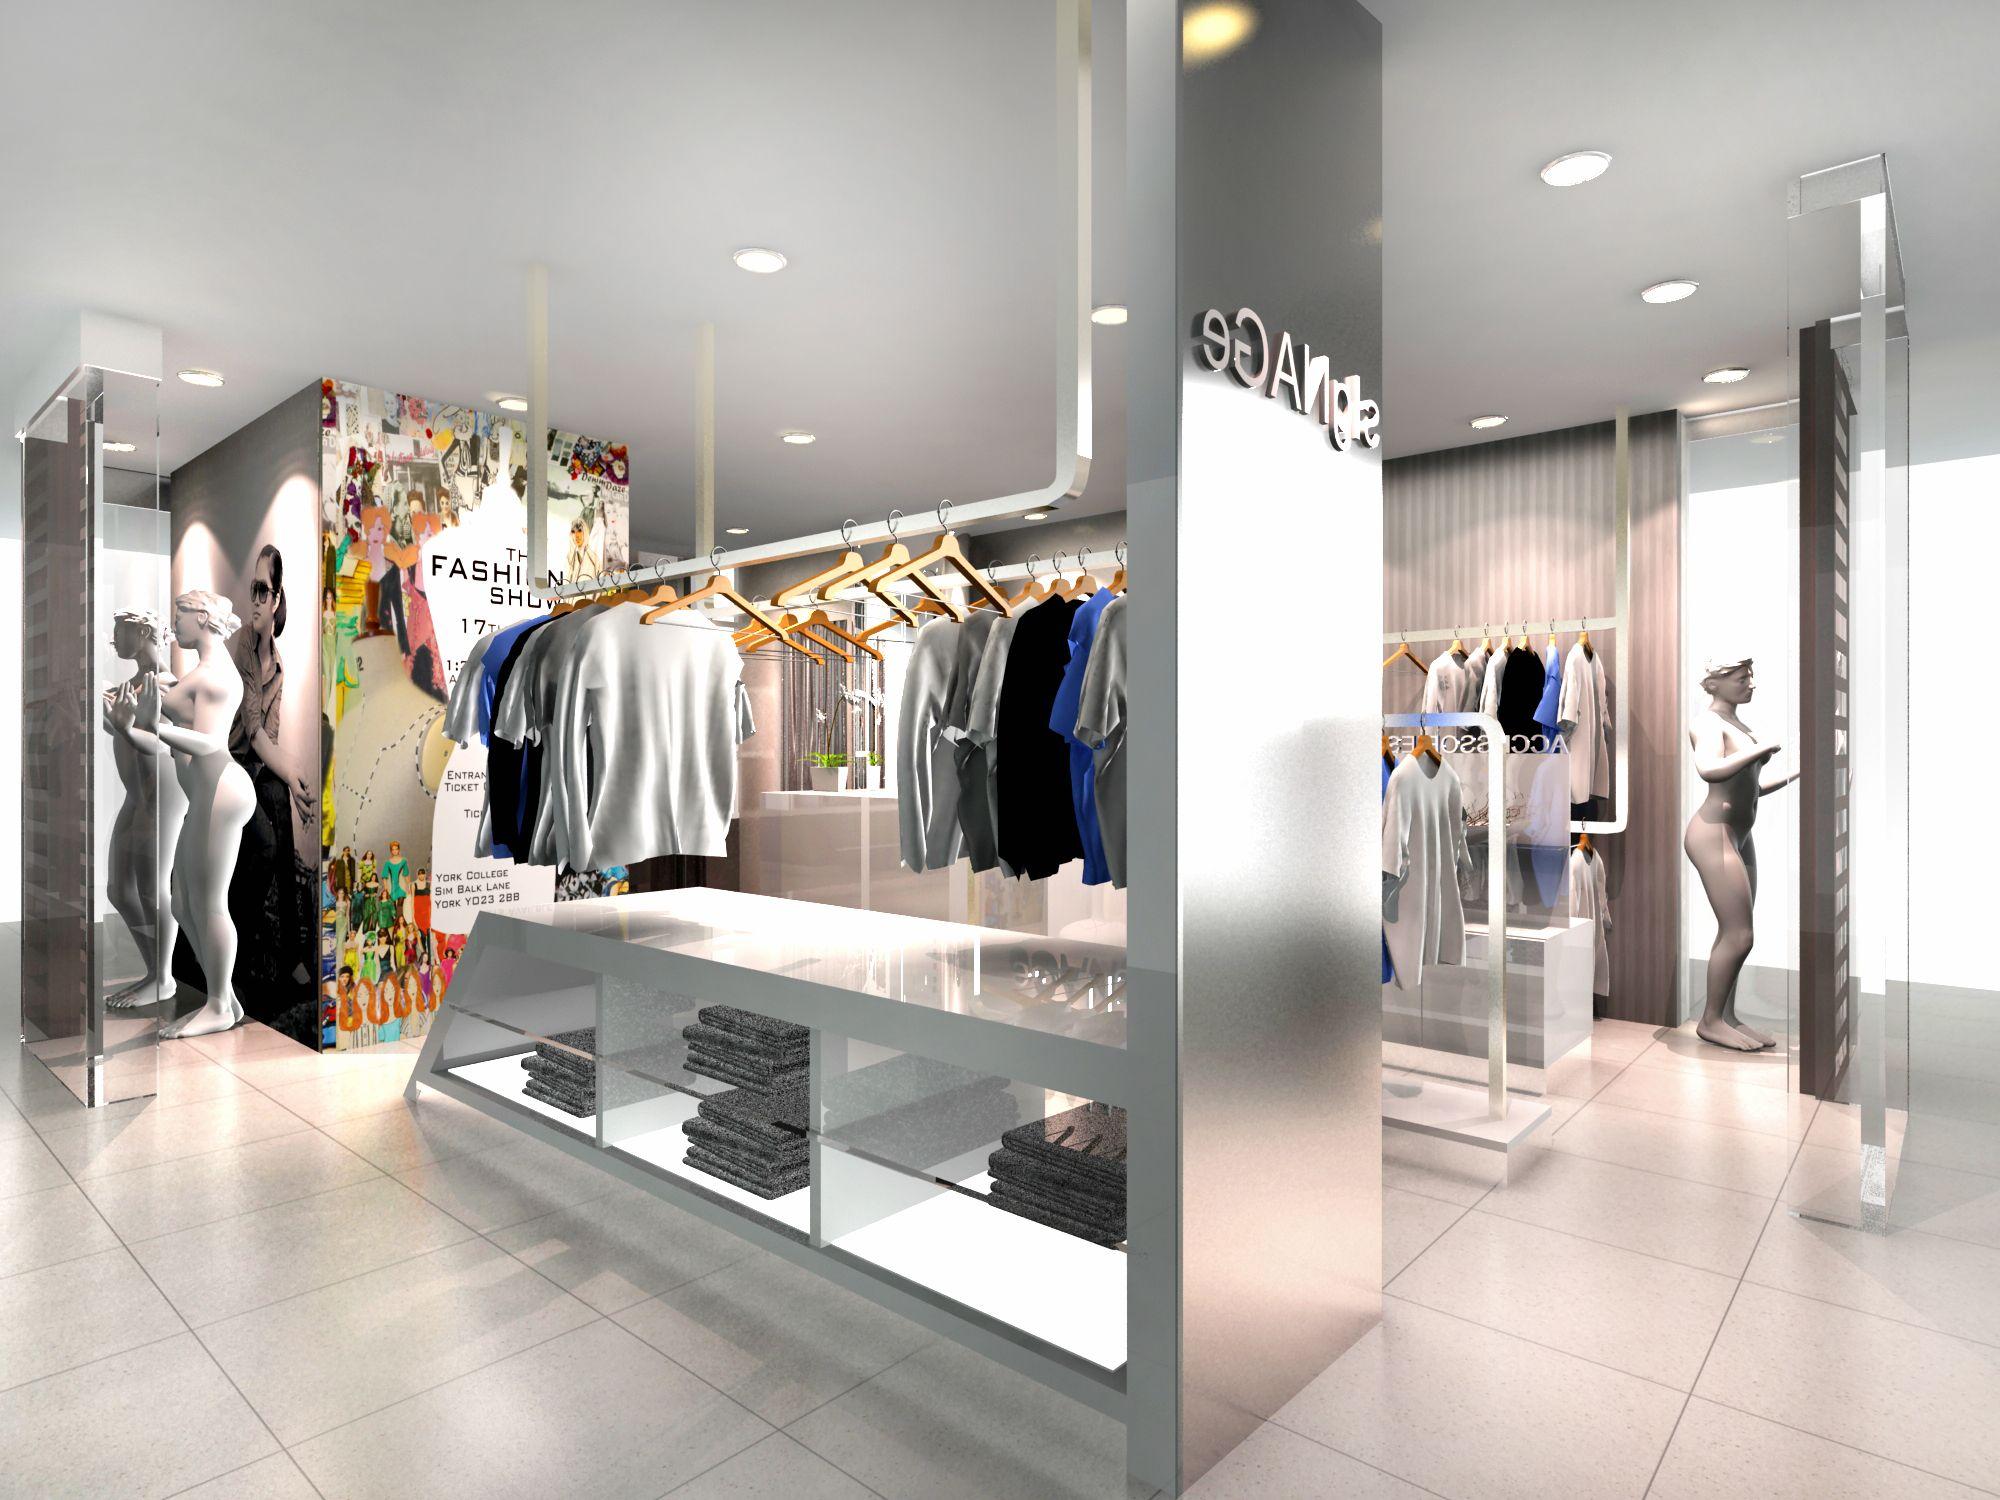 Retail shop design in Singapore. I-bridge offers you ...